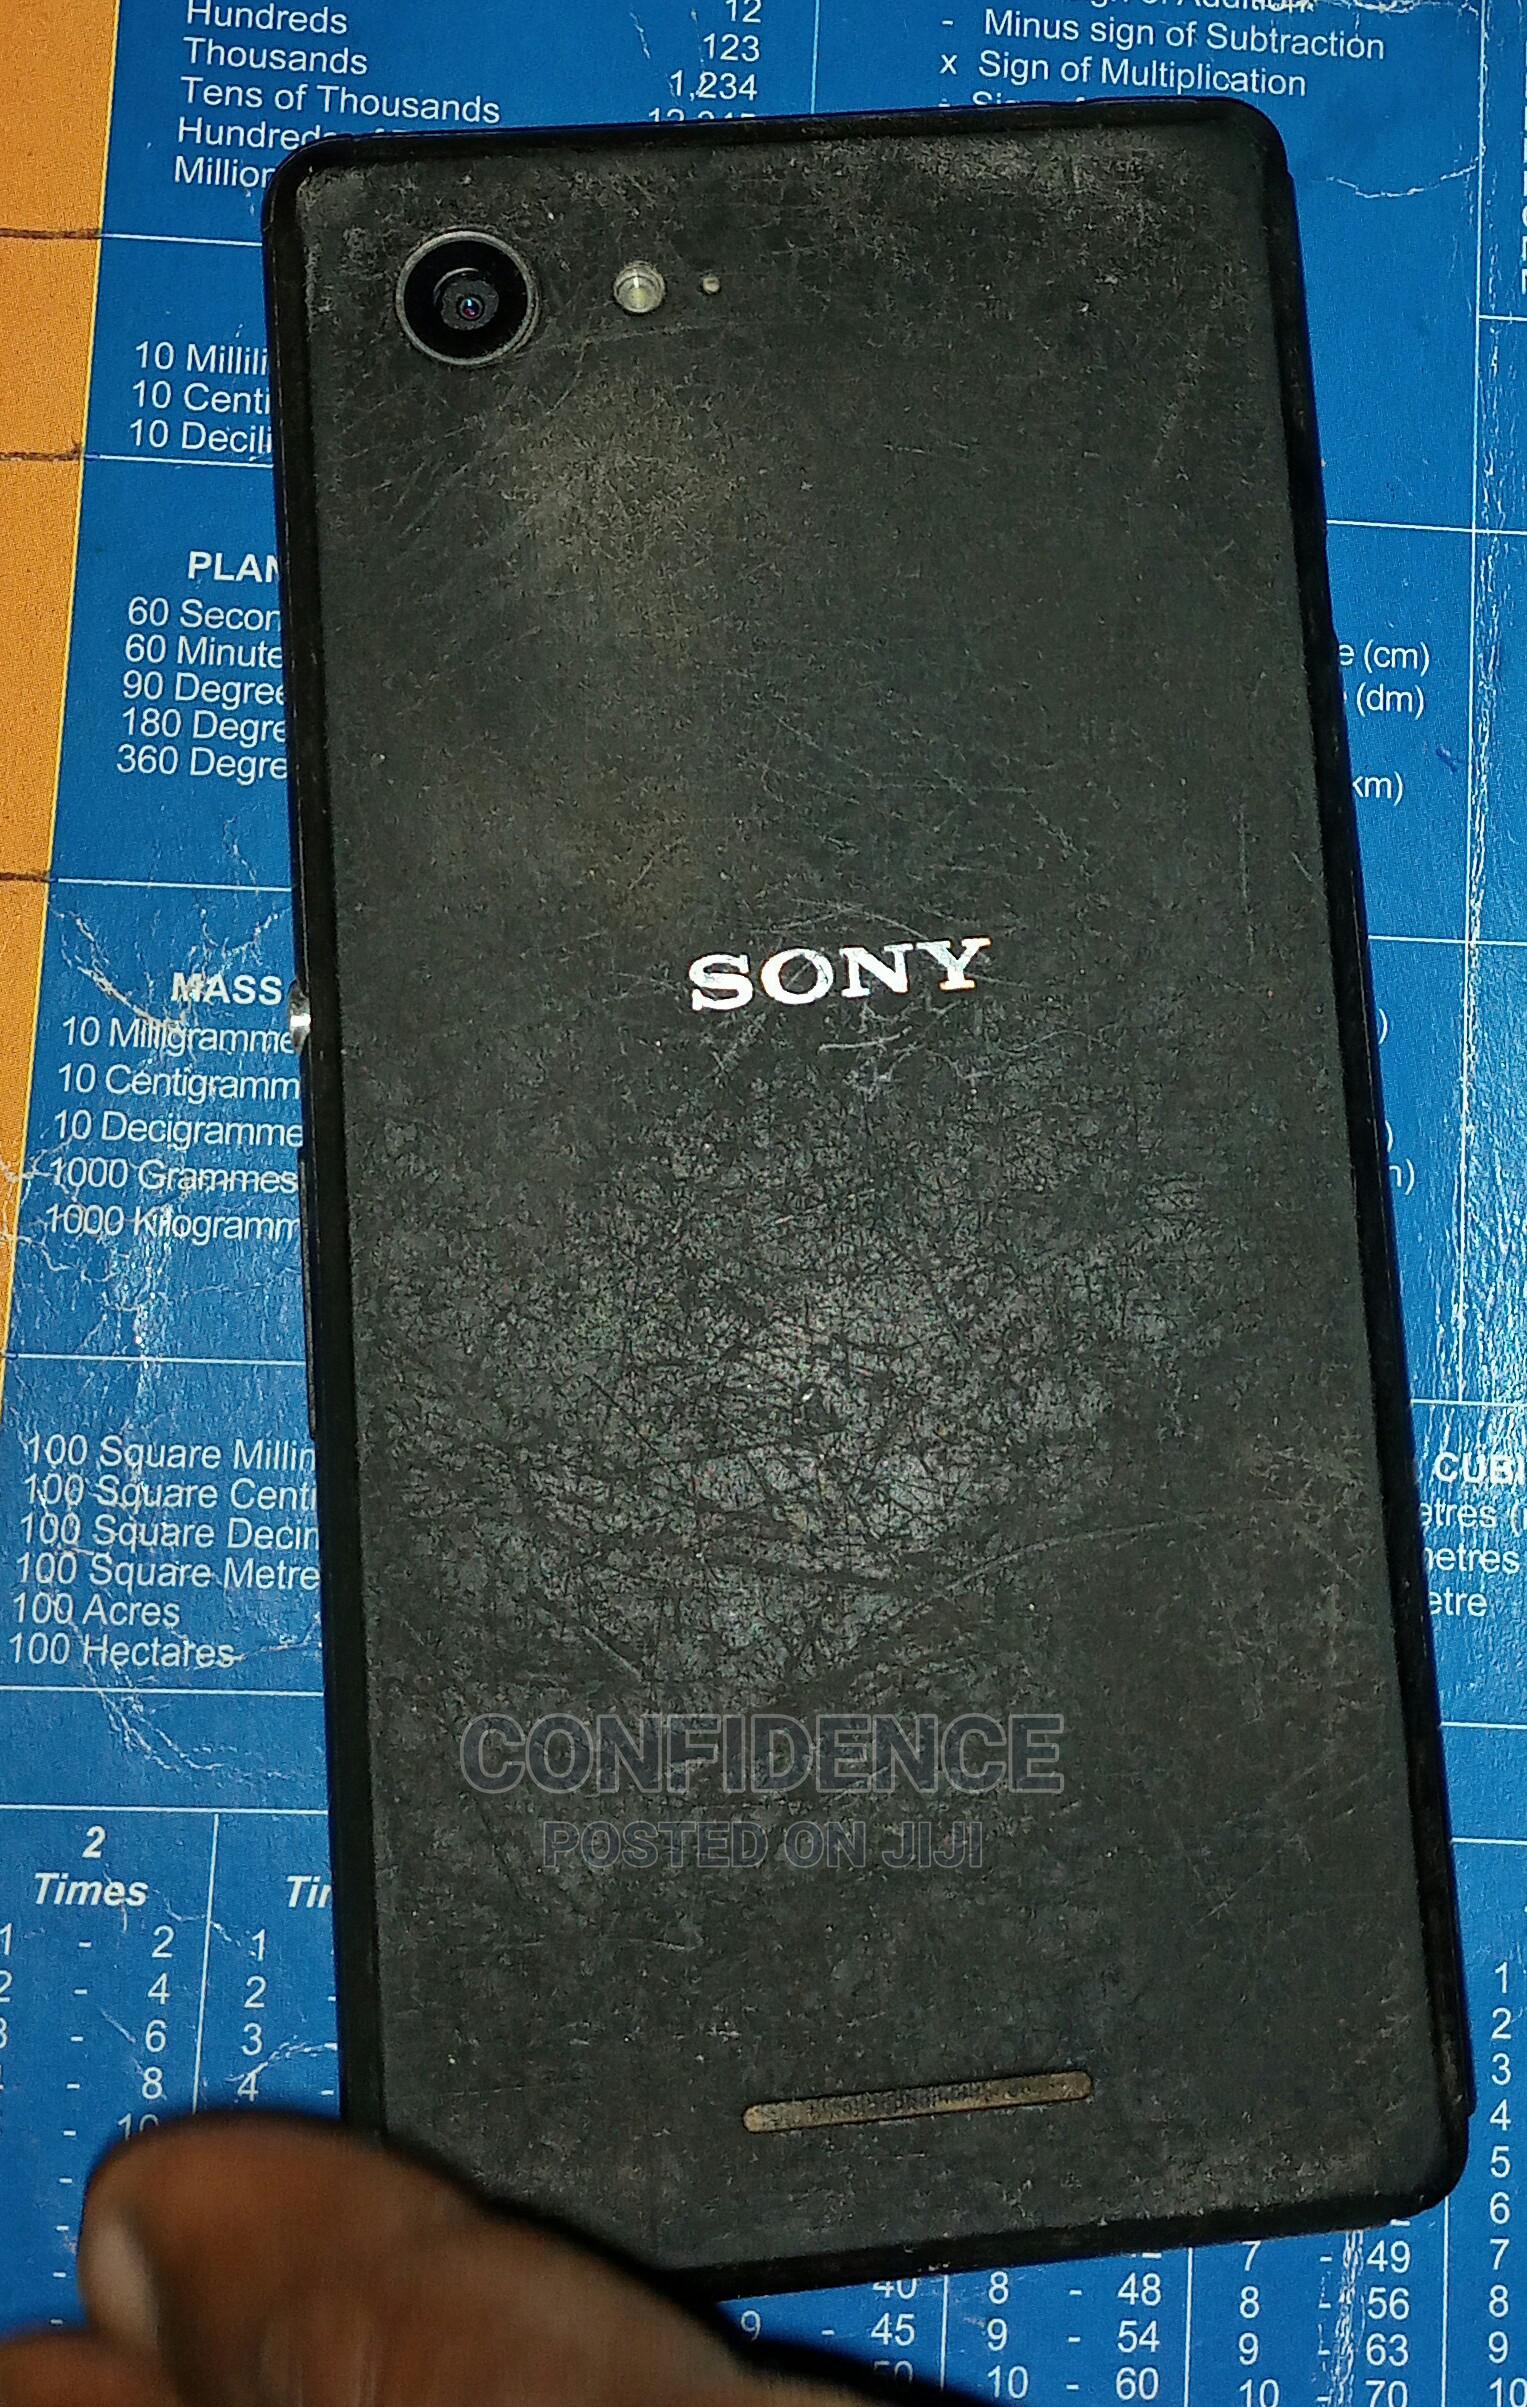 Sony D 2403 8 GB Black